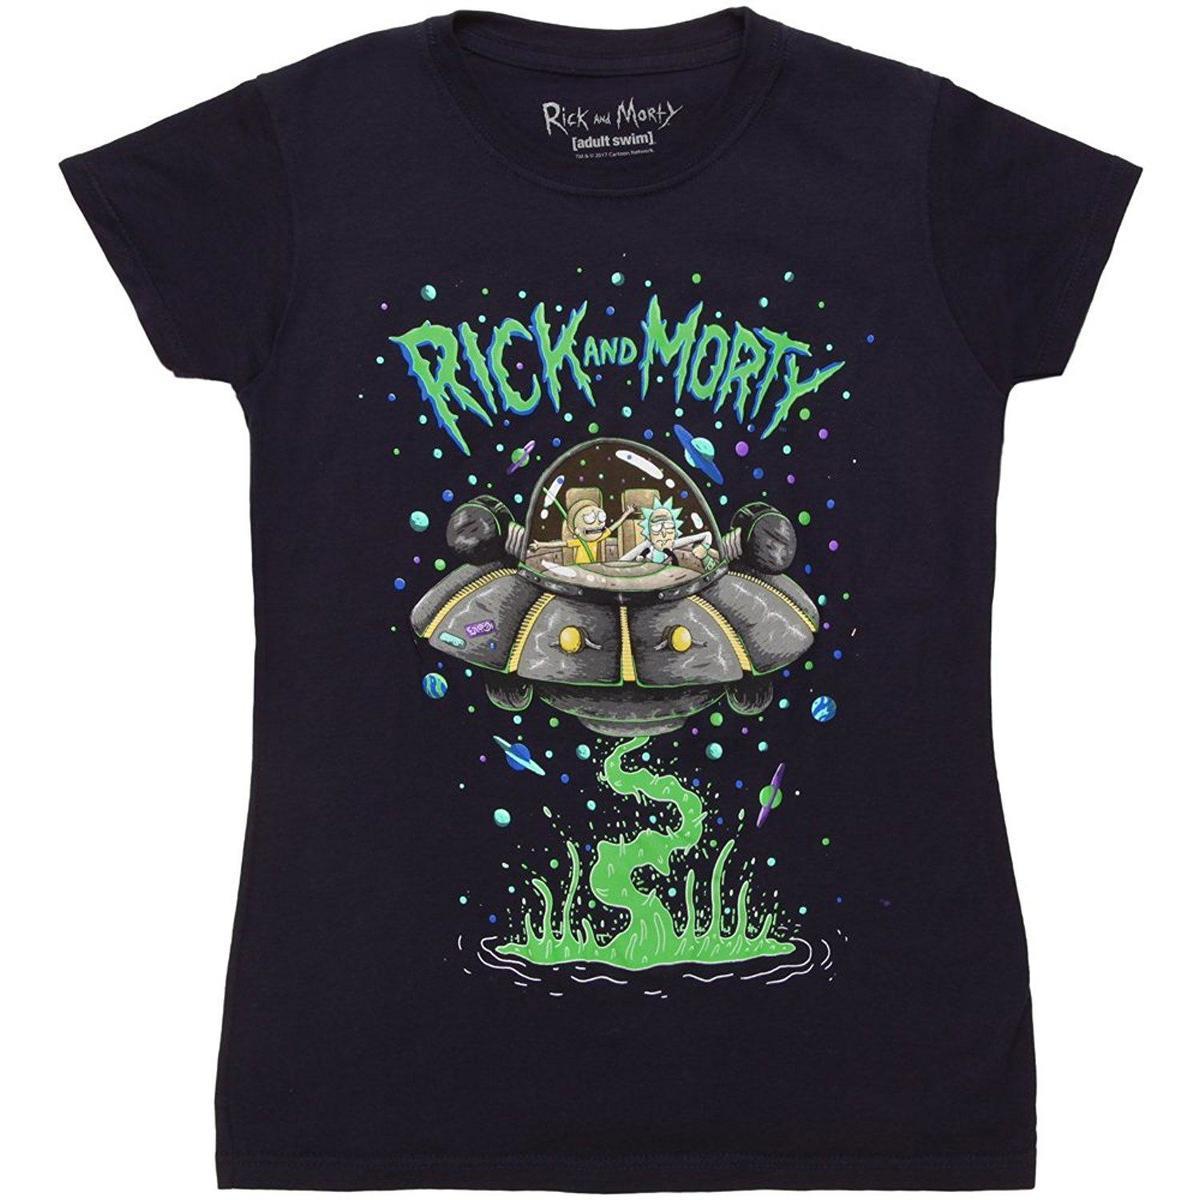 e170b3d5 Ripple Junction Rick & Morty Spaceship Juniors T Shirt Quality T Shirts T  Shirt Slogans From Liguo005, $12.79  DHgate.Com